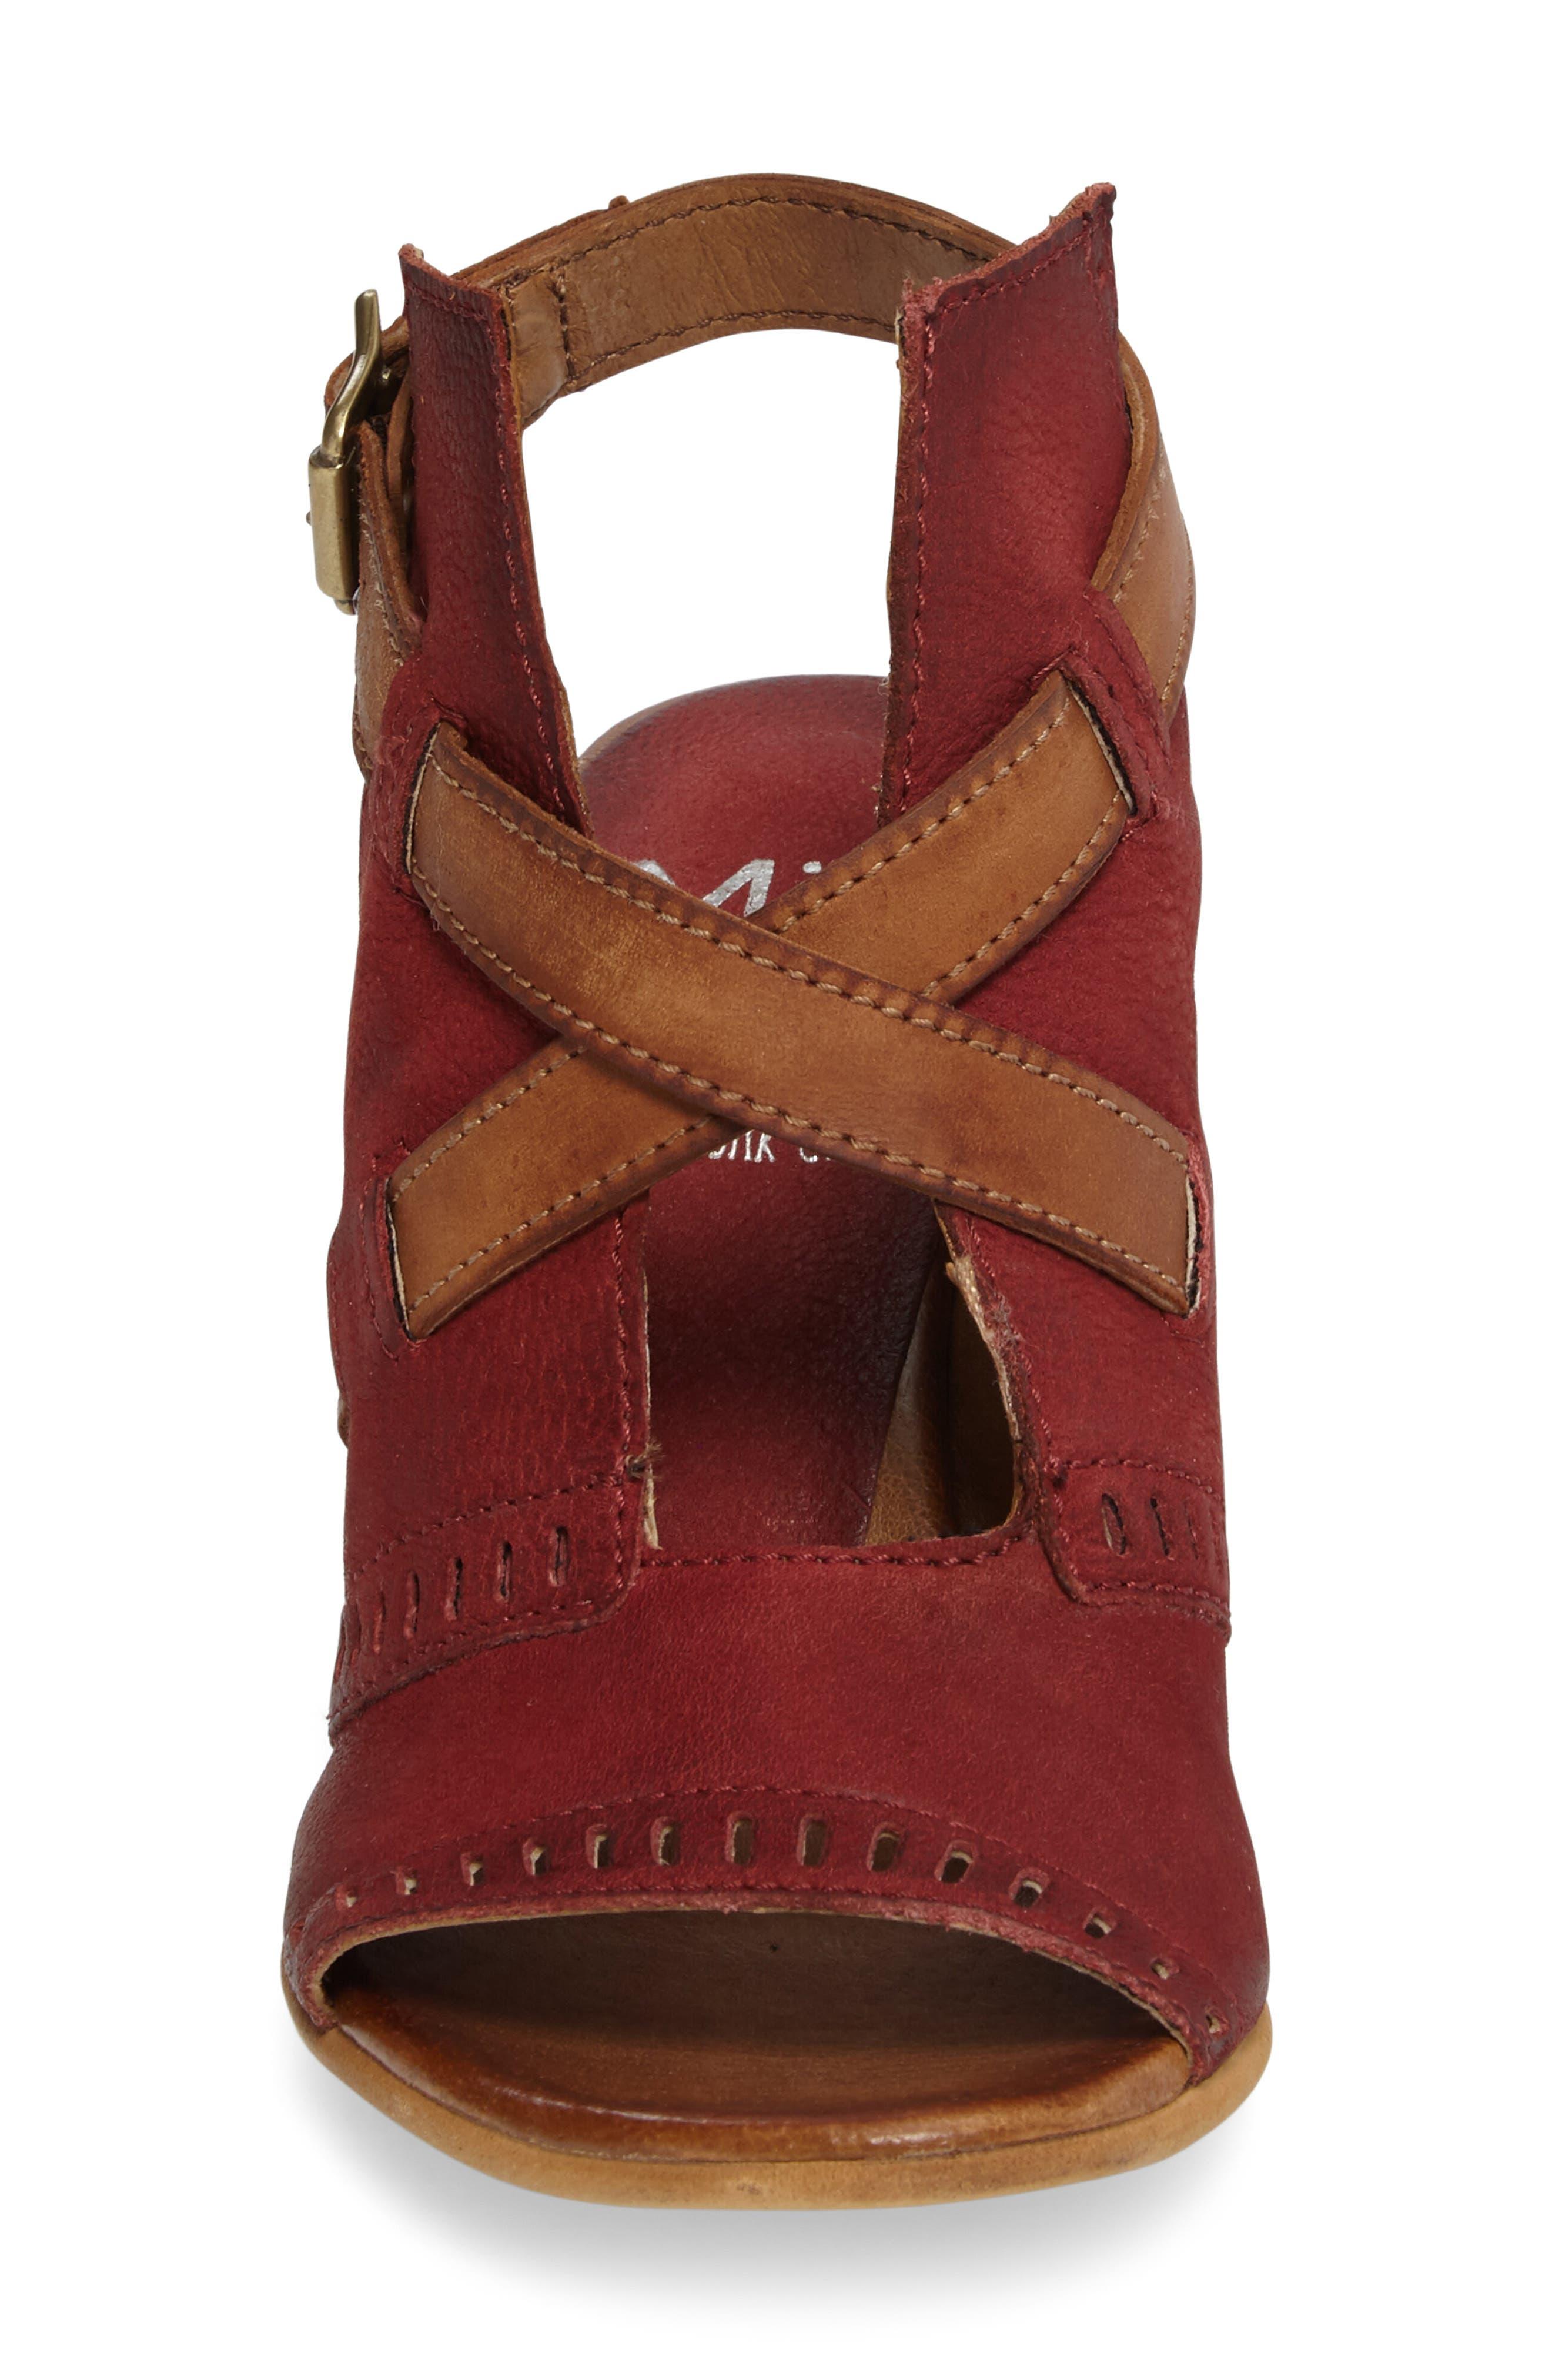 Kipling Perforated Sandal,                             Alternate thumbnail 16, color,